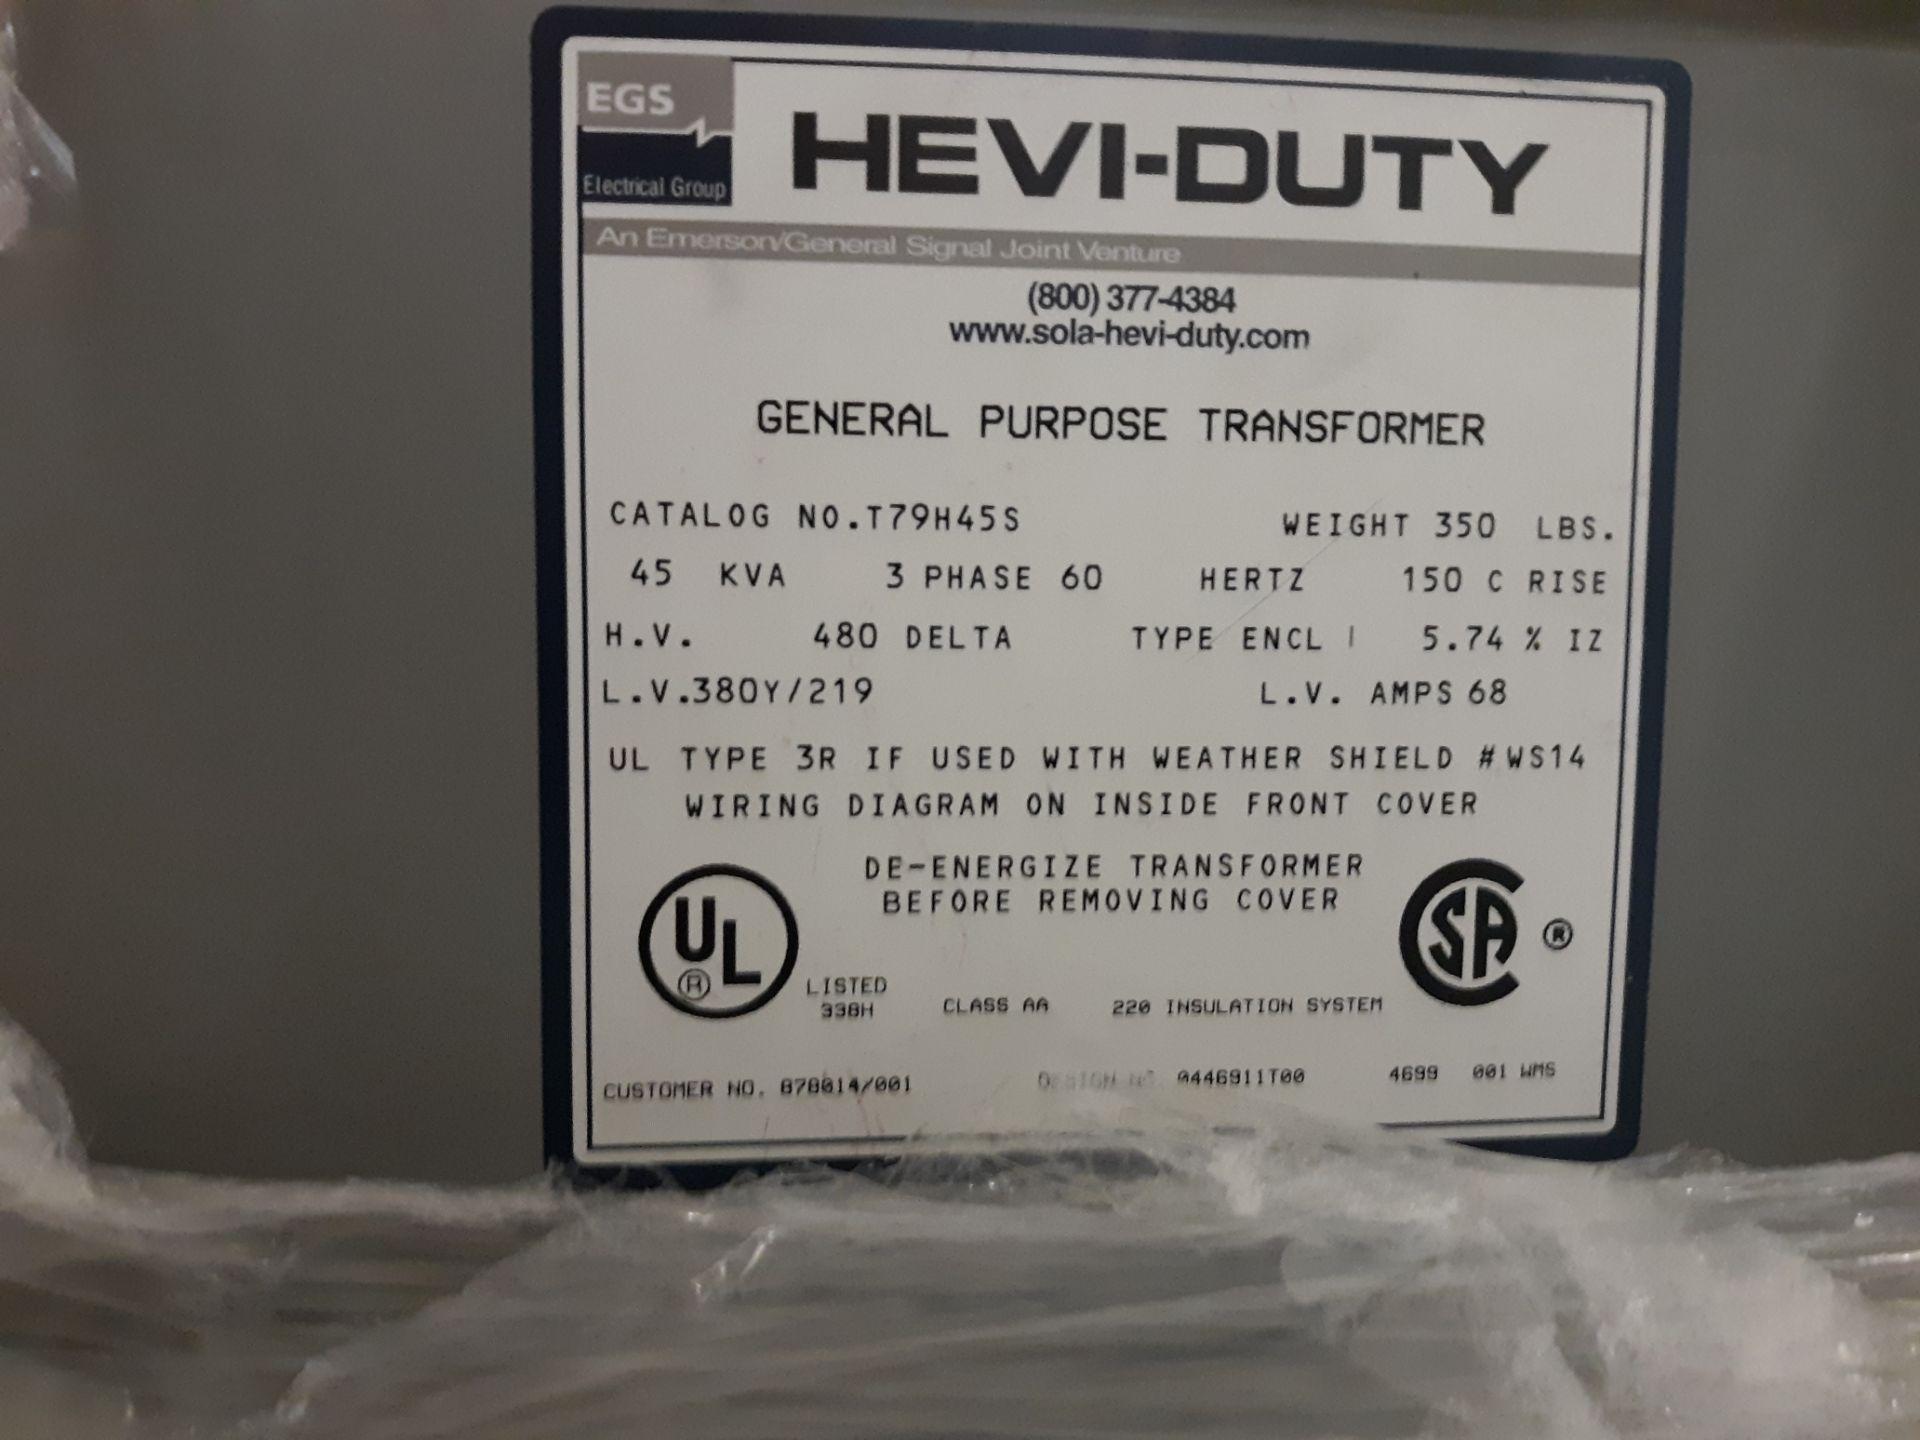 Lot 14 - EGS HEVI-DUTY GENERAL PURPOSE TRANSFORMER 45KVA/ 3PH/60HG: RIGGING FEE: $10